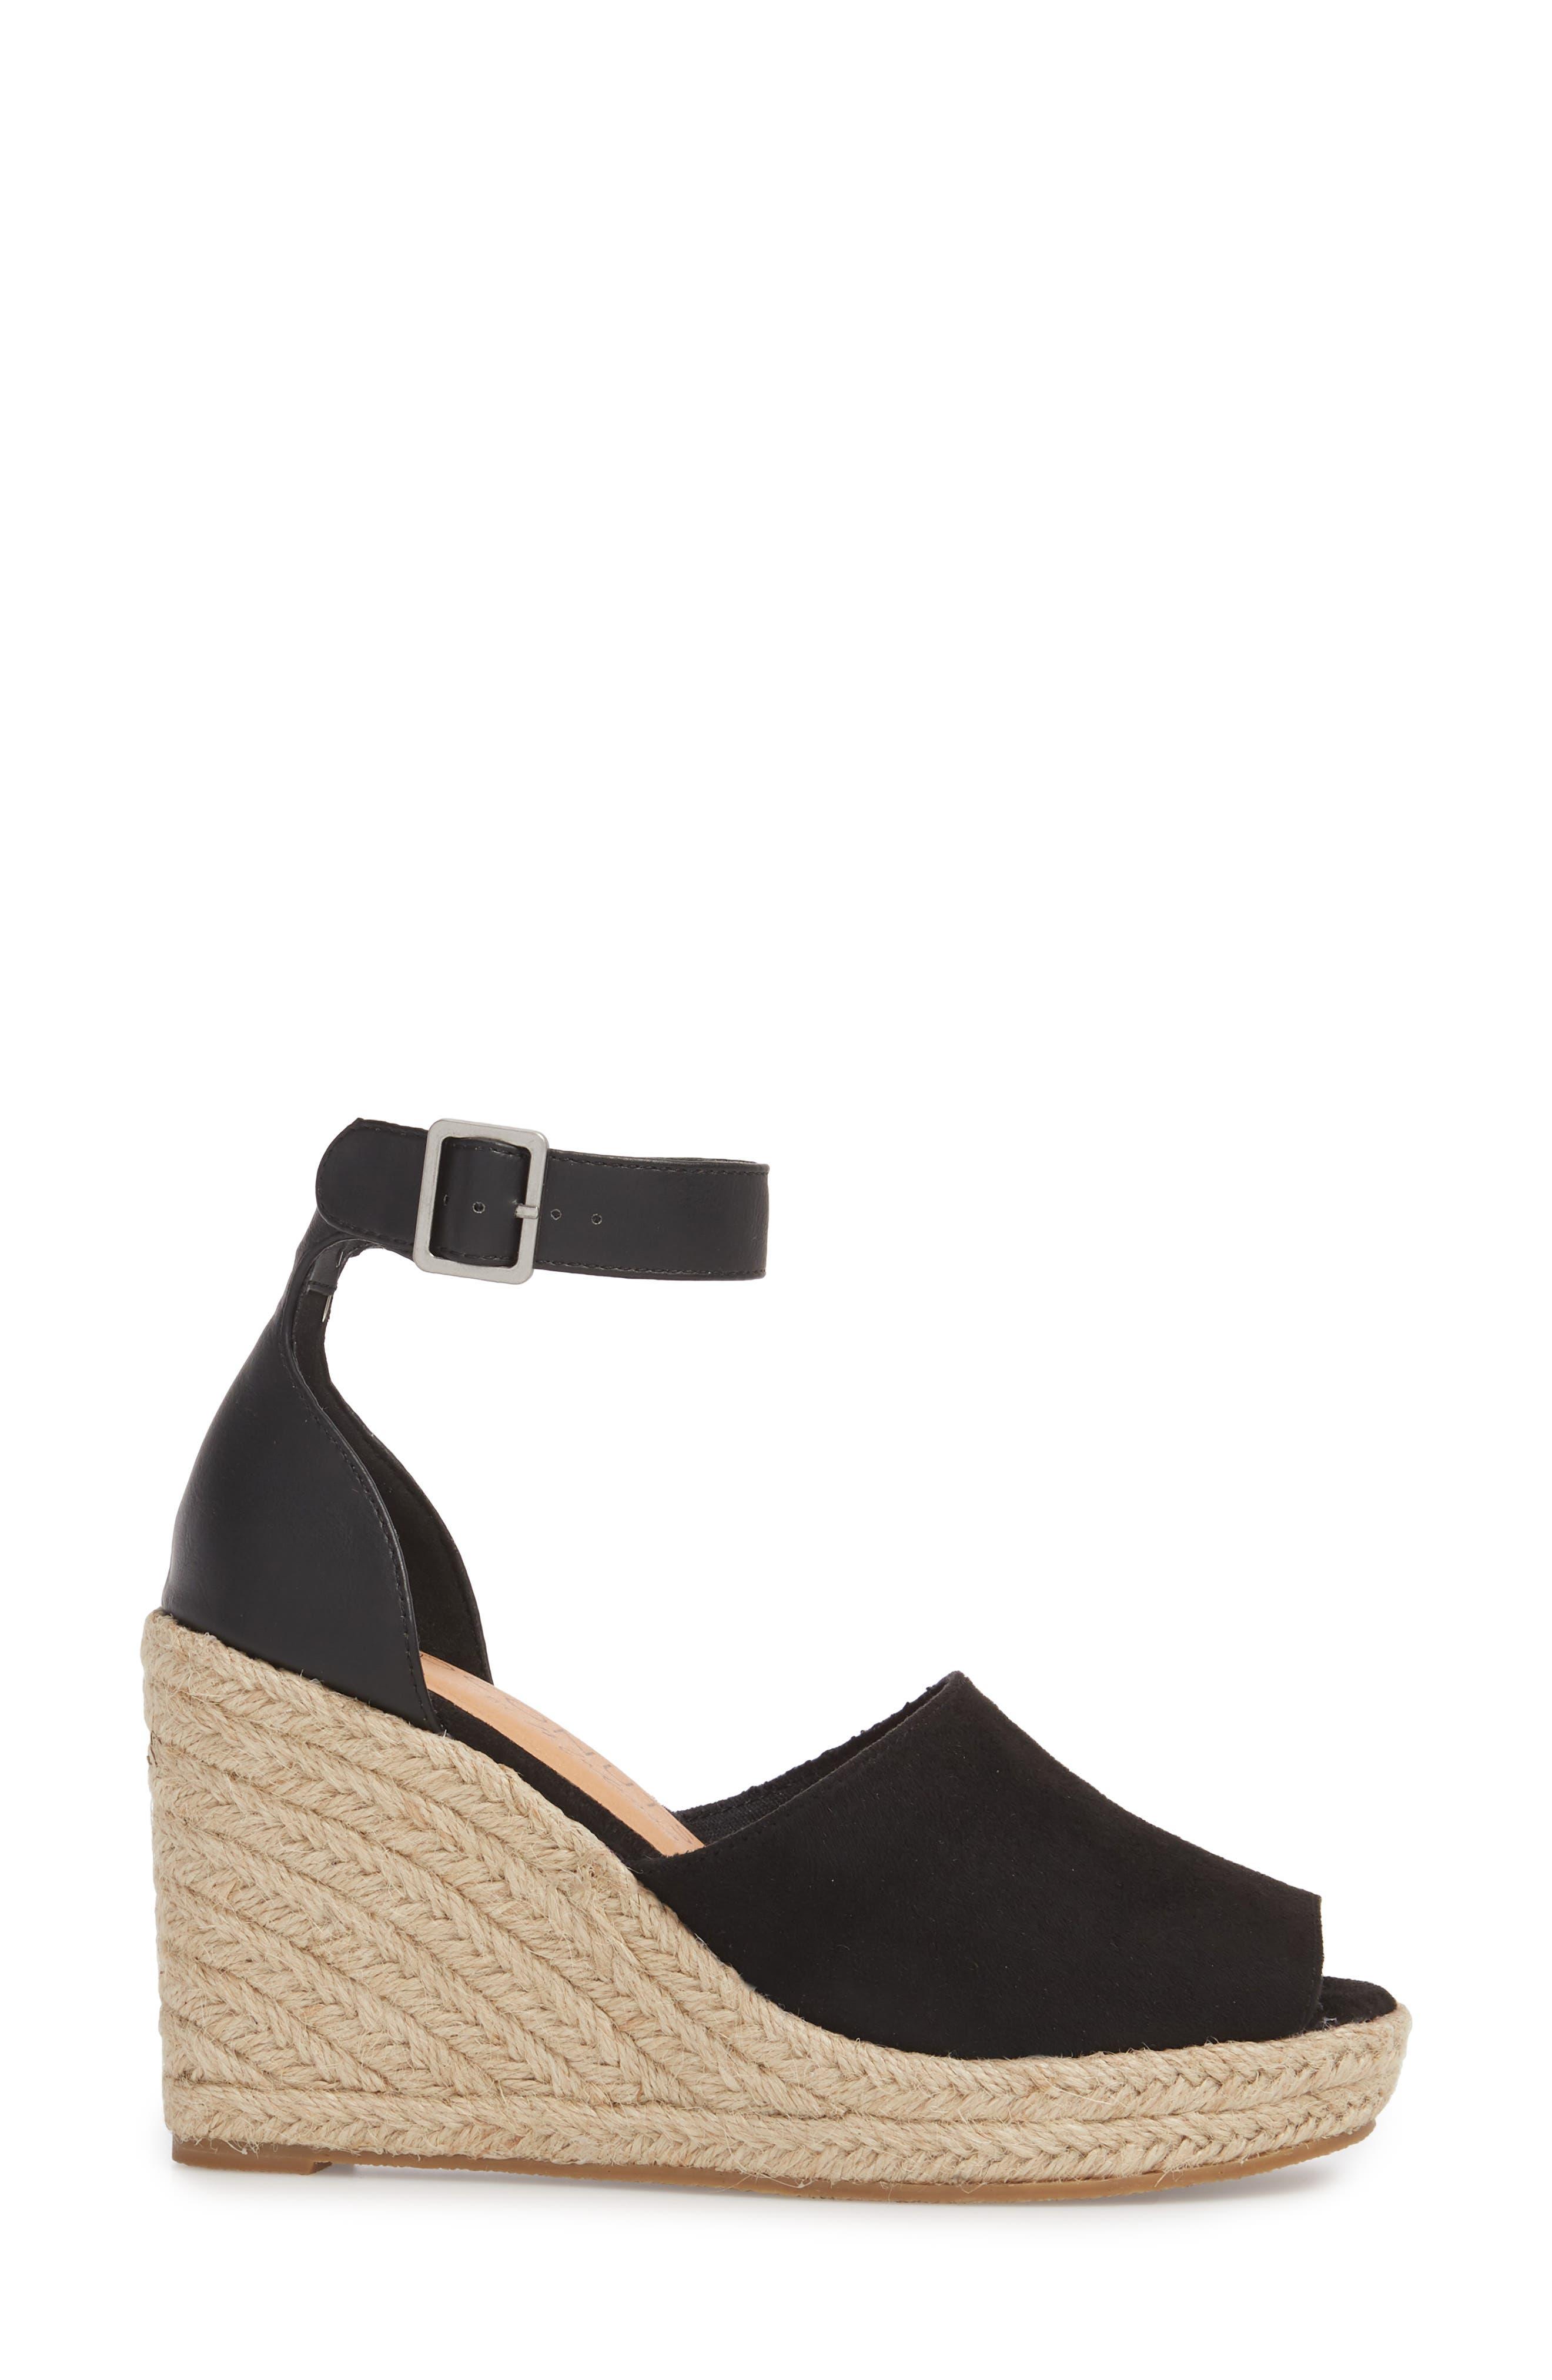 Flamingo Wedge Sandal,                             Alternate thumbnail 3, color,                             Black Suede